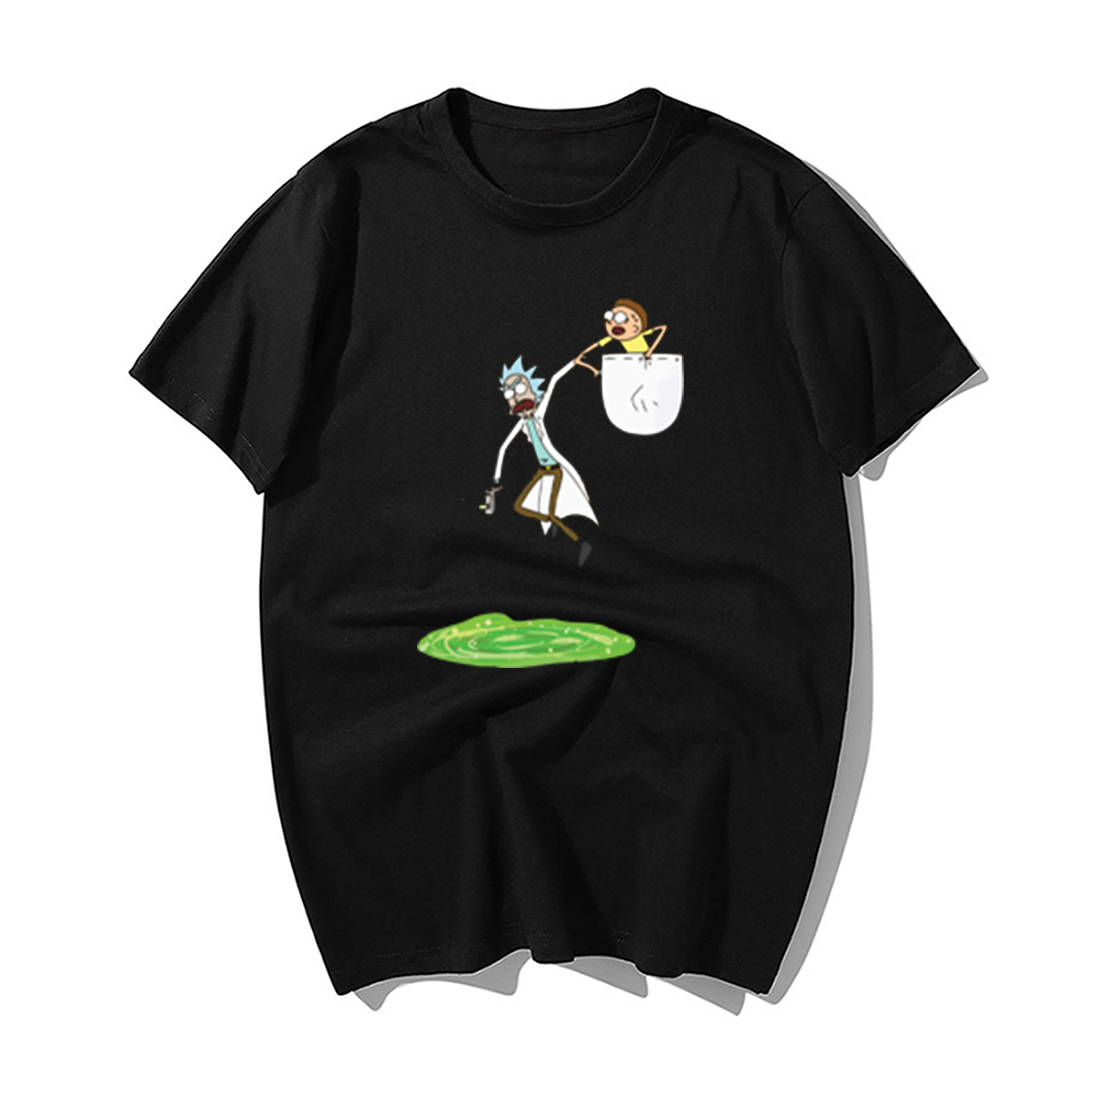 Funny Rick And Morty T Shirt Hip Hop Tops Men Fashion Print Tshirts 2019 Summer Cotton Short Sleeve Tshirt Harajuku Streetwear